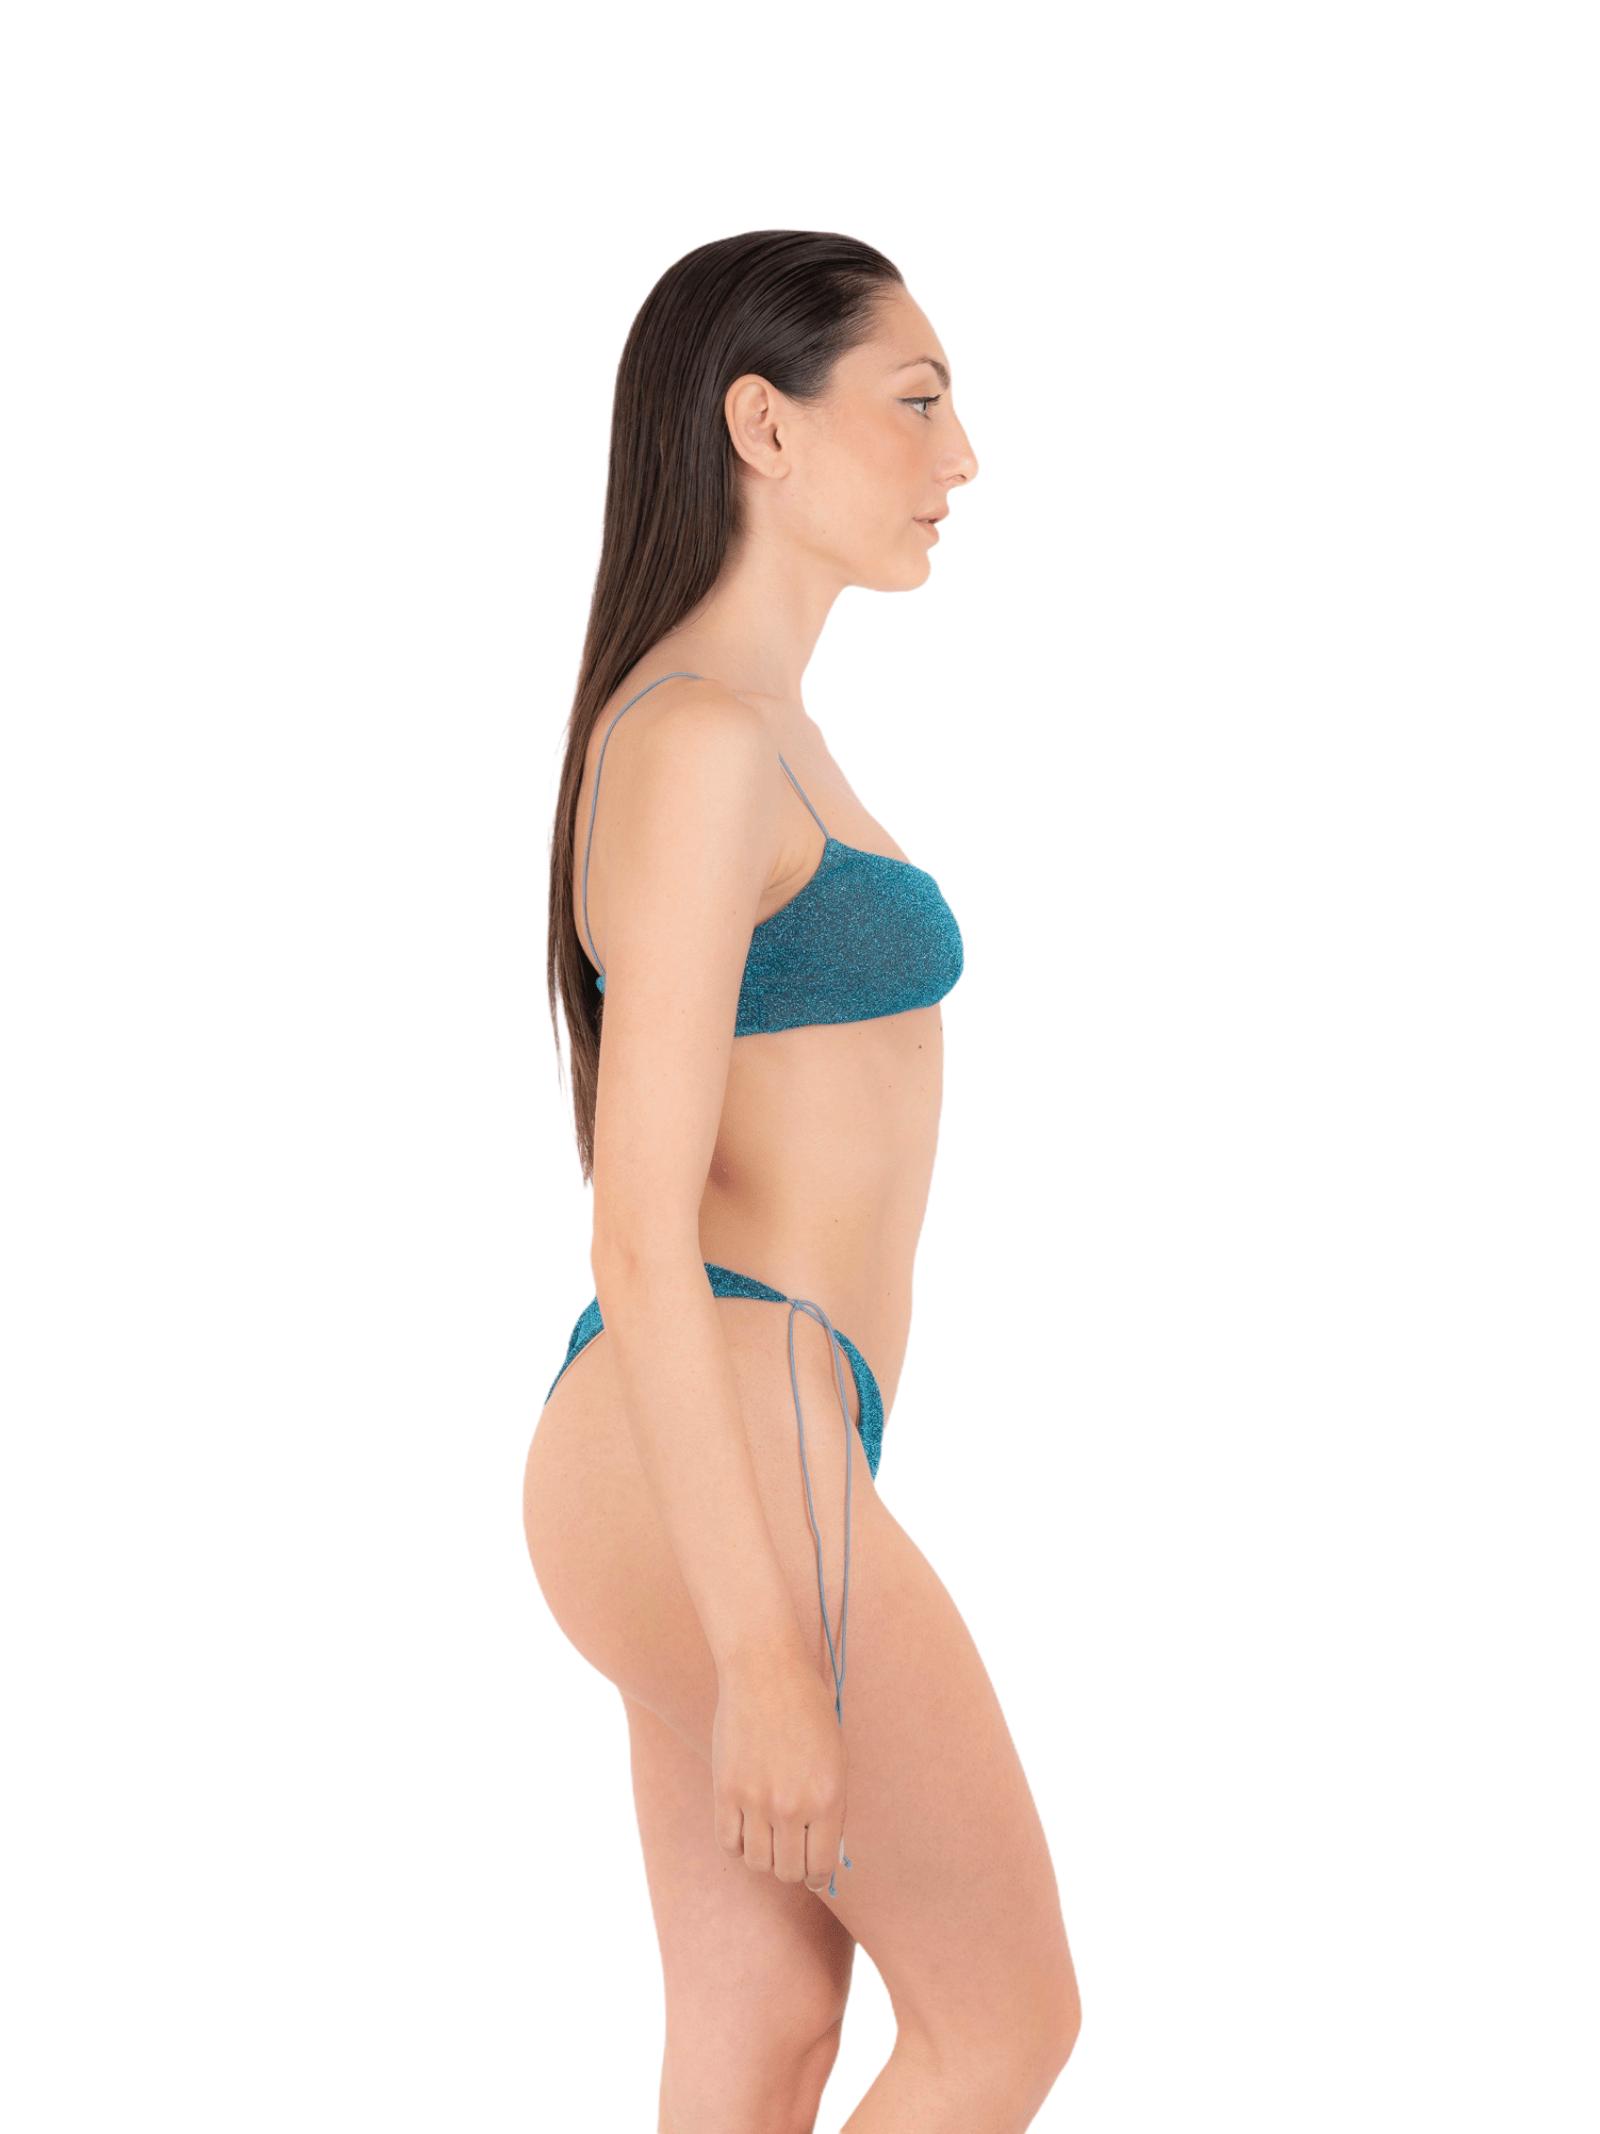 Bikini top with bow slip ANNAMARE | 23 | BK-115BLU